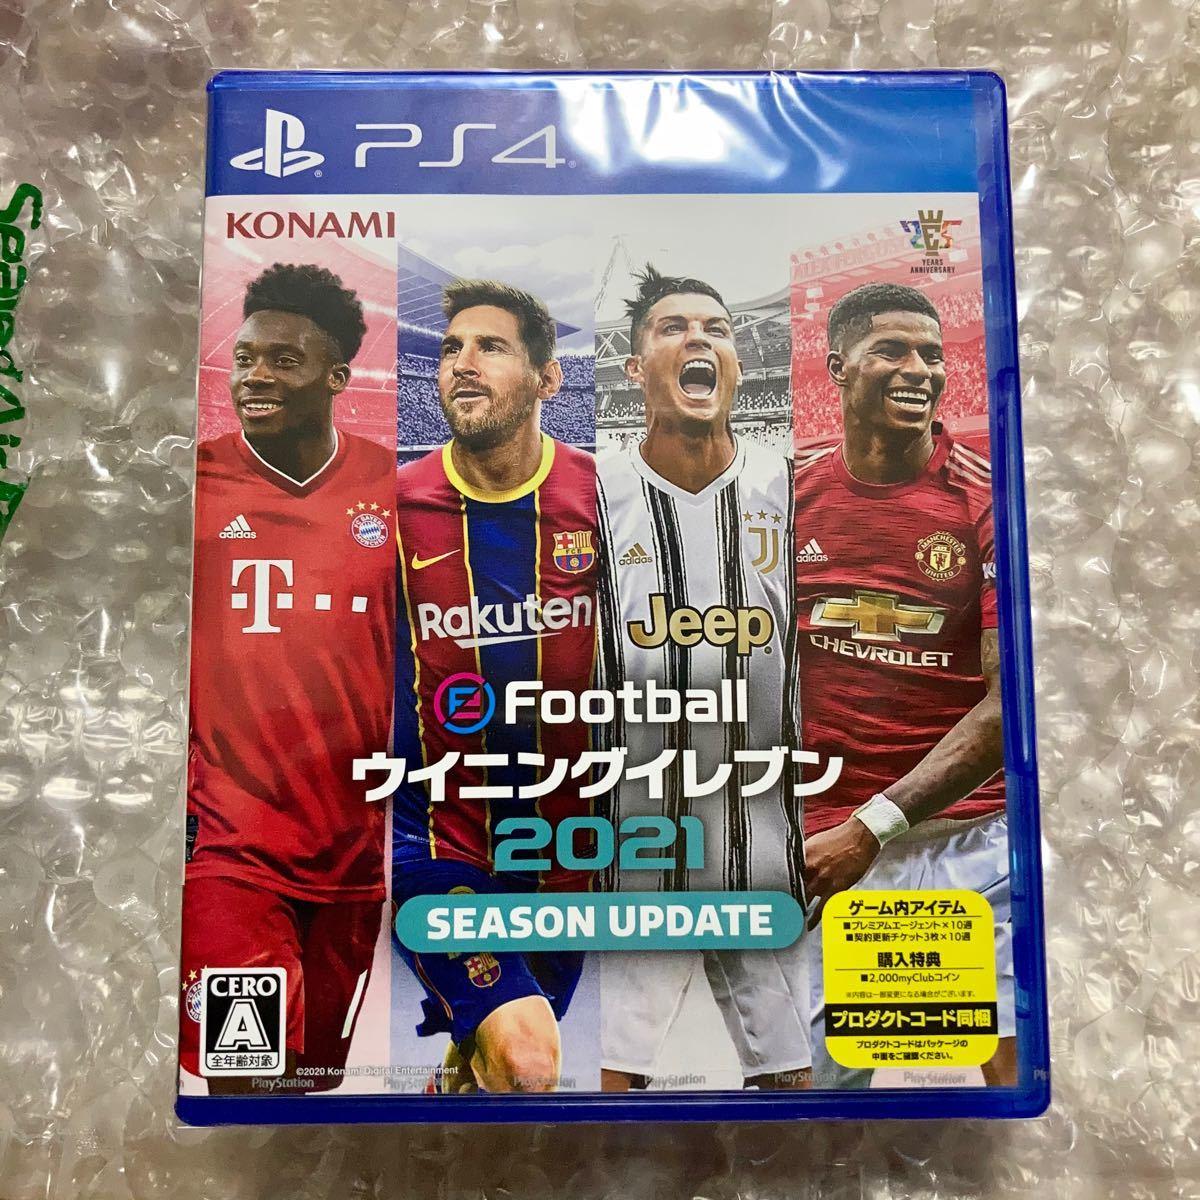 【PS4】 eFootball ウイニングイレブン 2021 SEASON UPDATE (通常版)